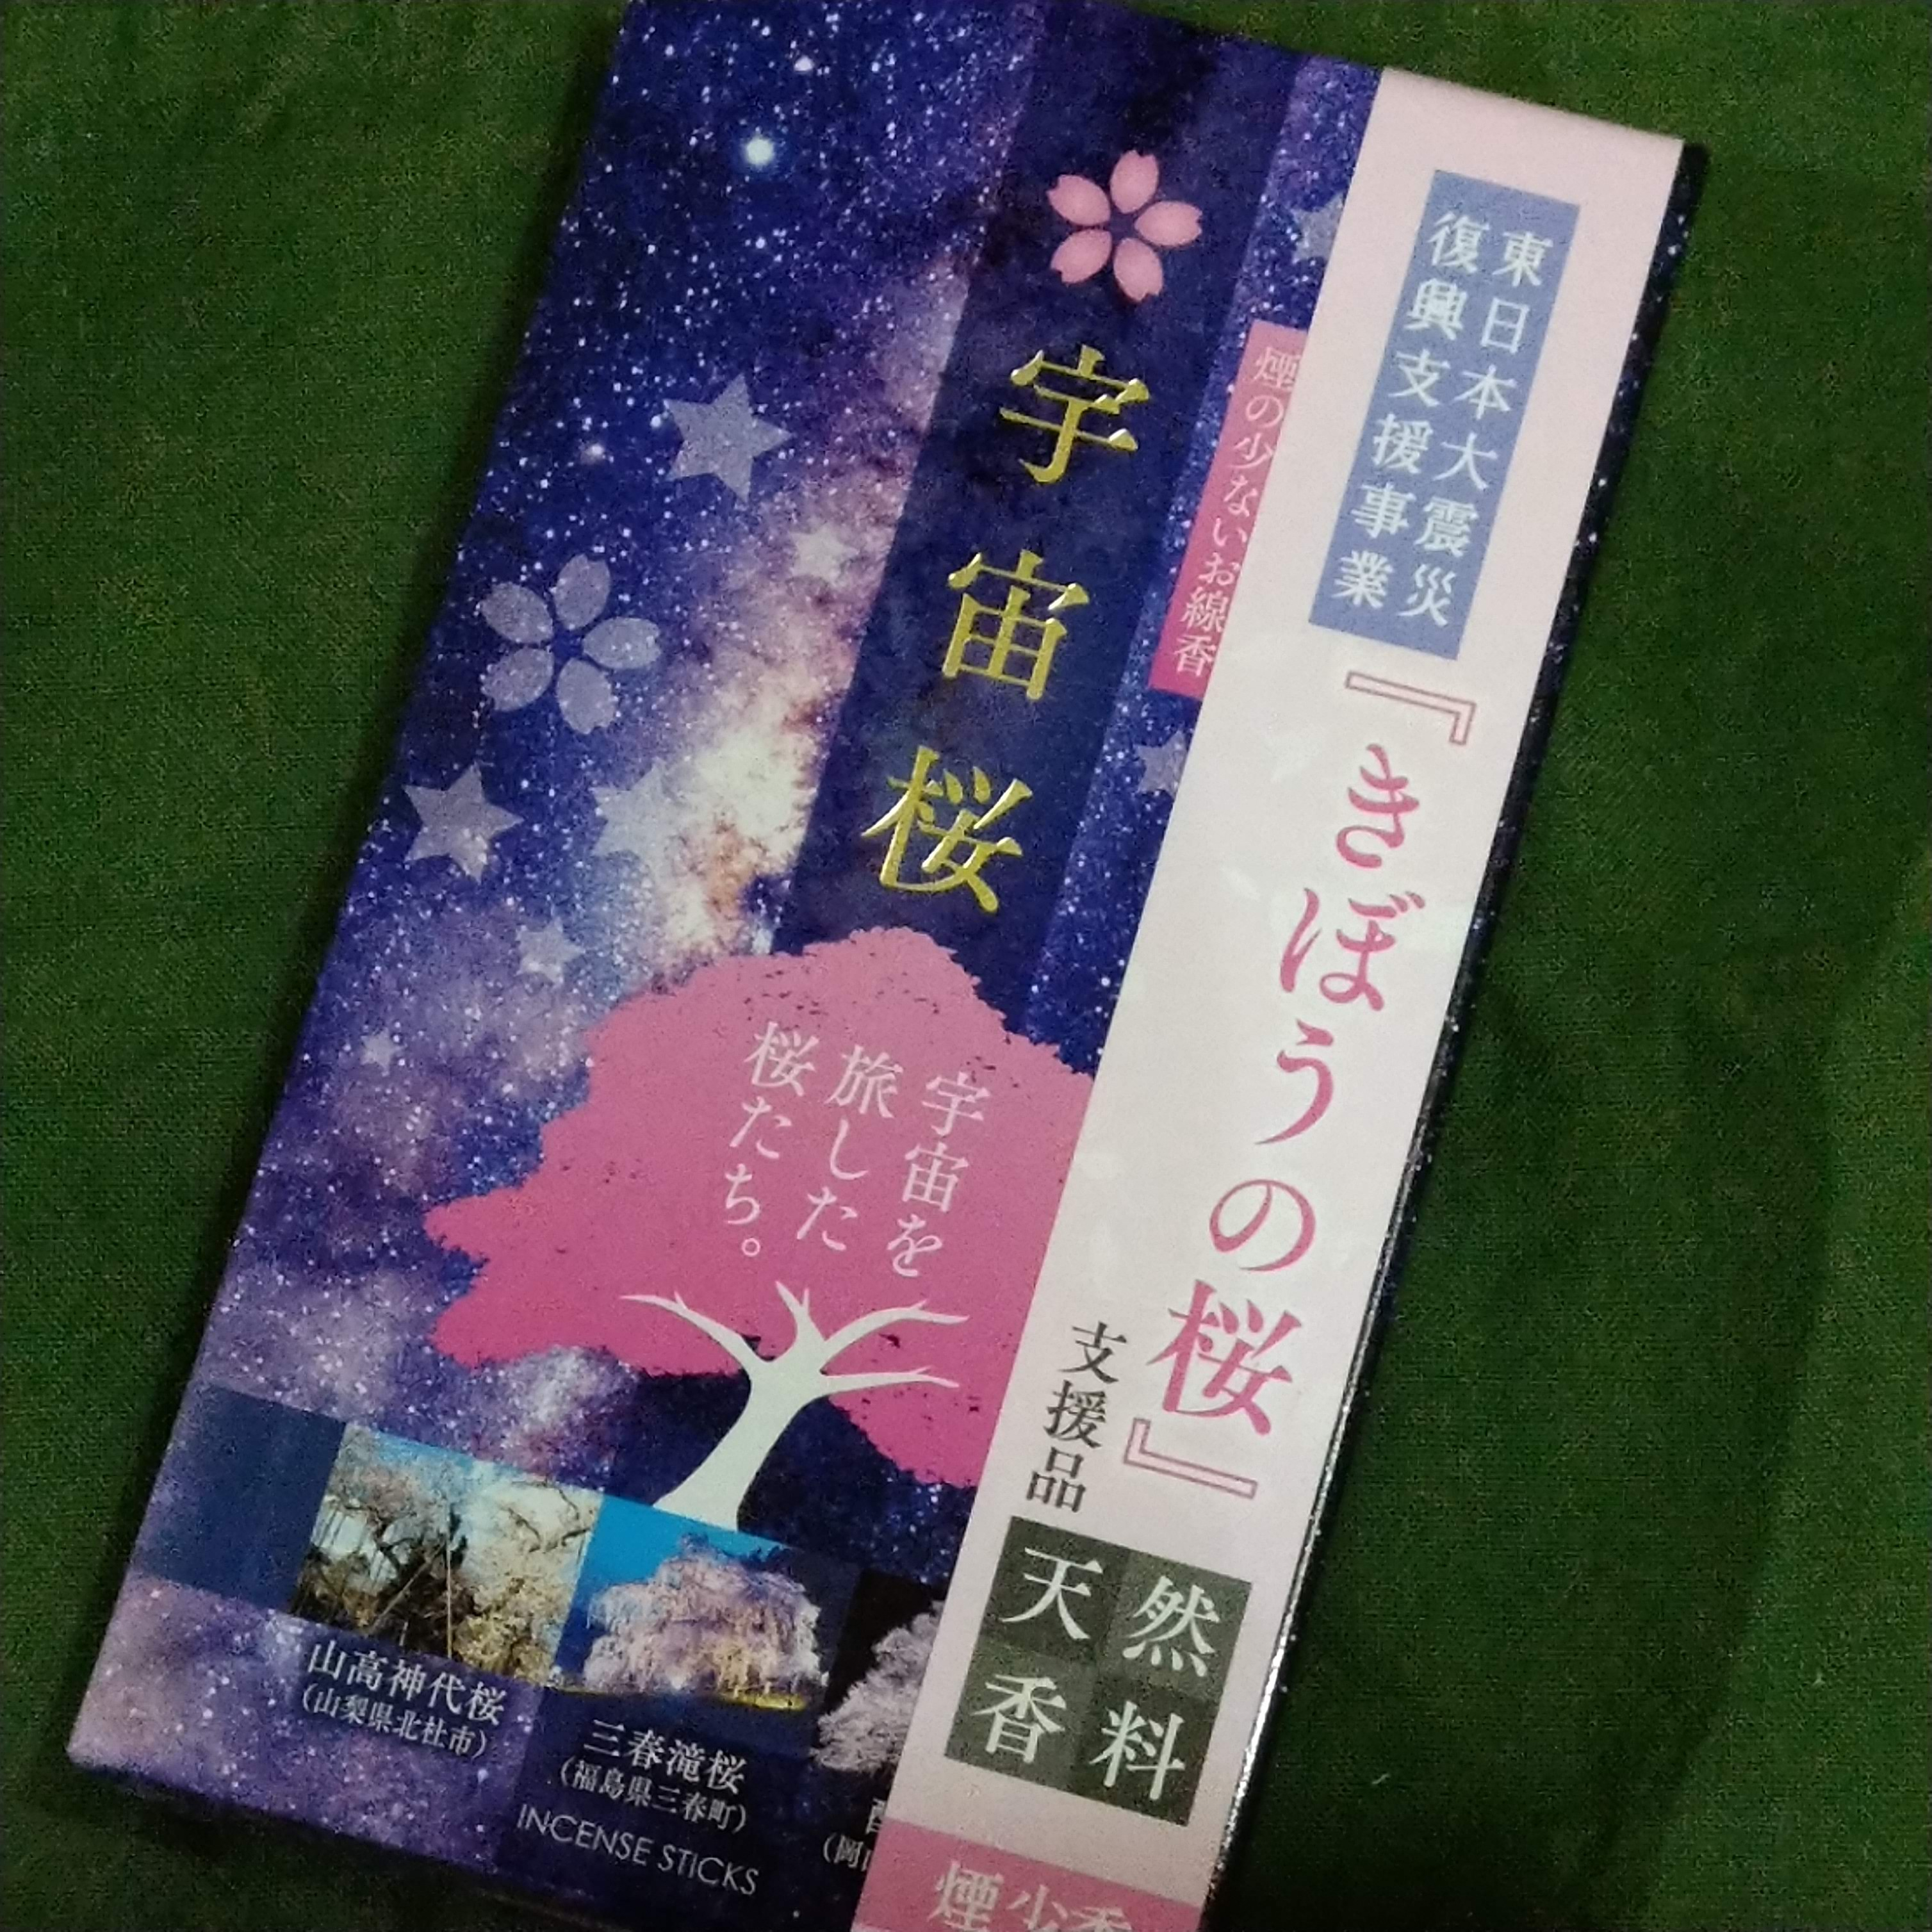 東日本大震災復興支援事業『きぼうの桜』支援品【宇宙桜】梅薫堂